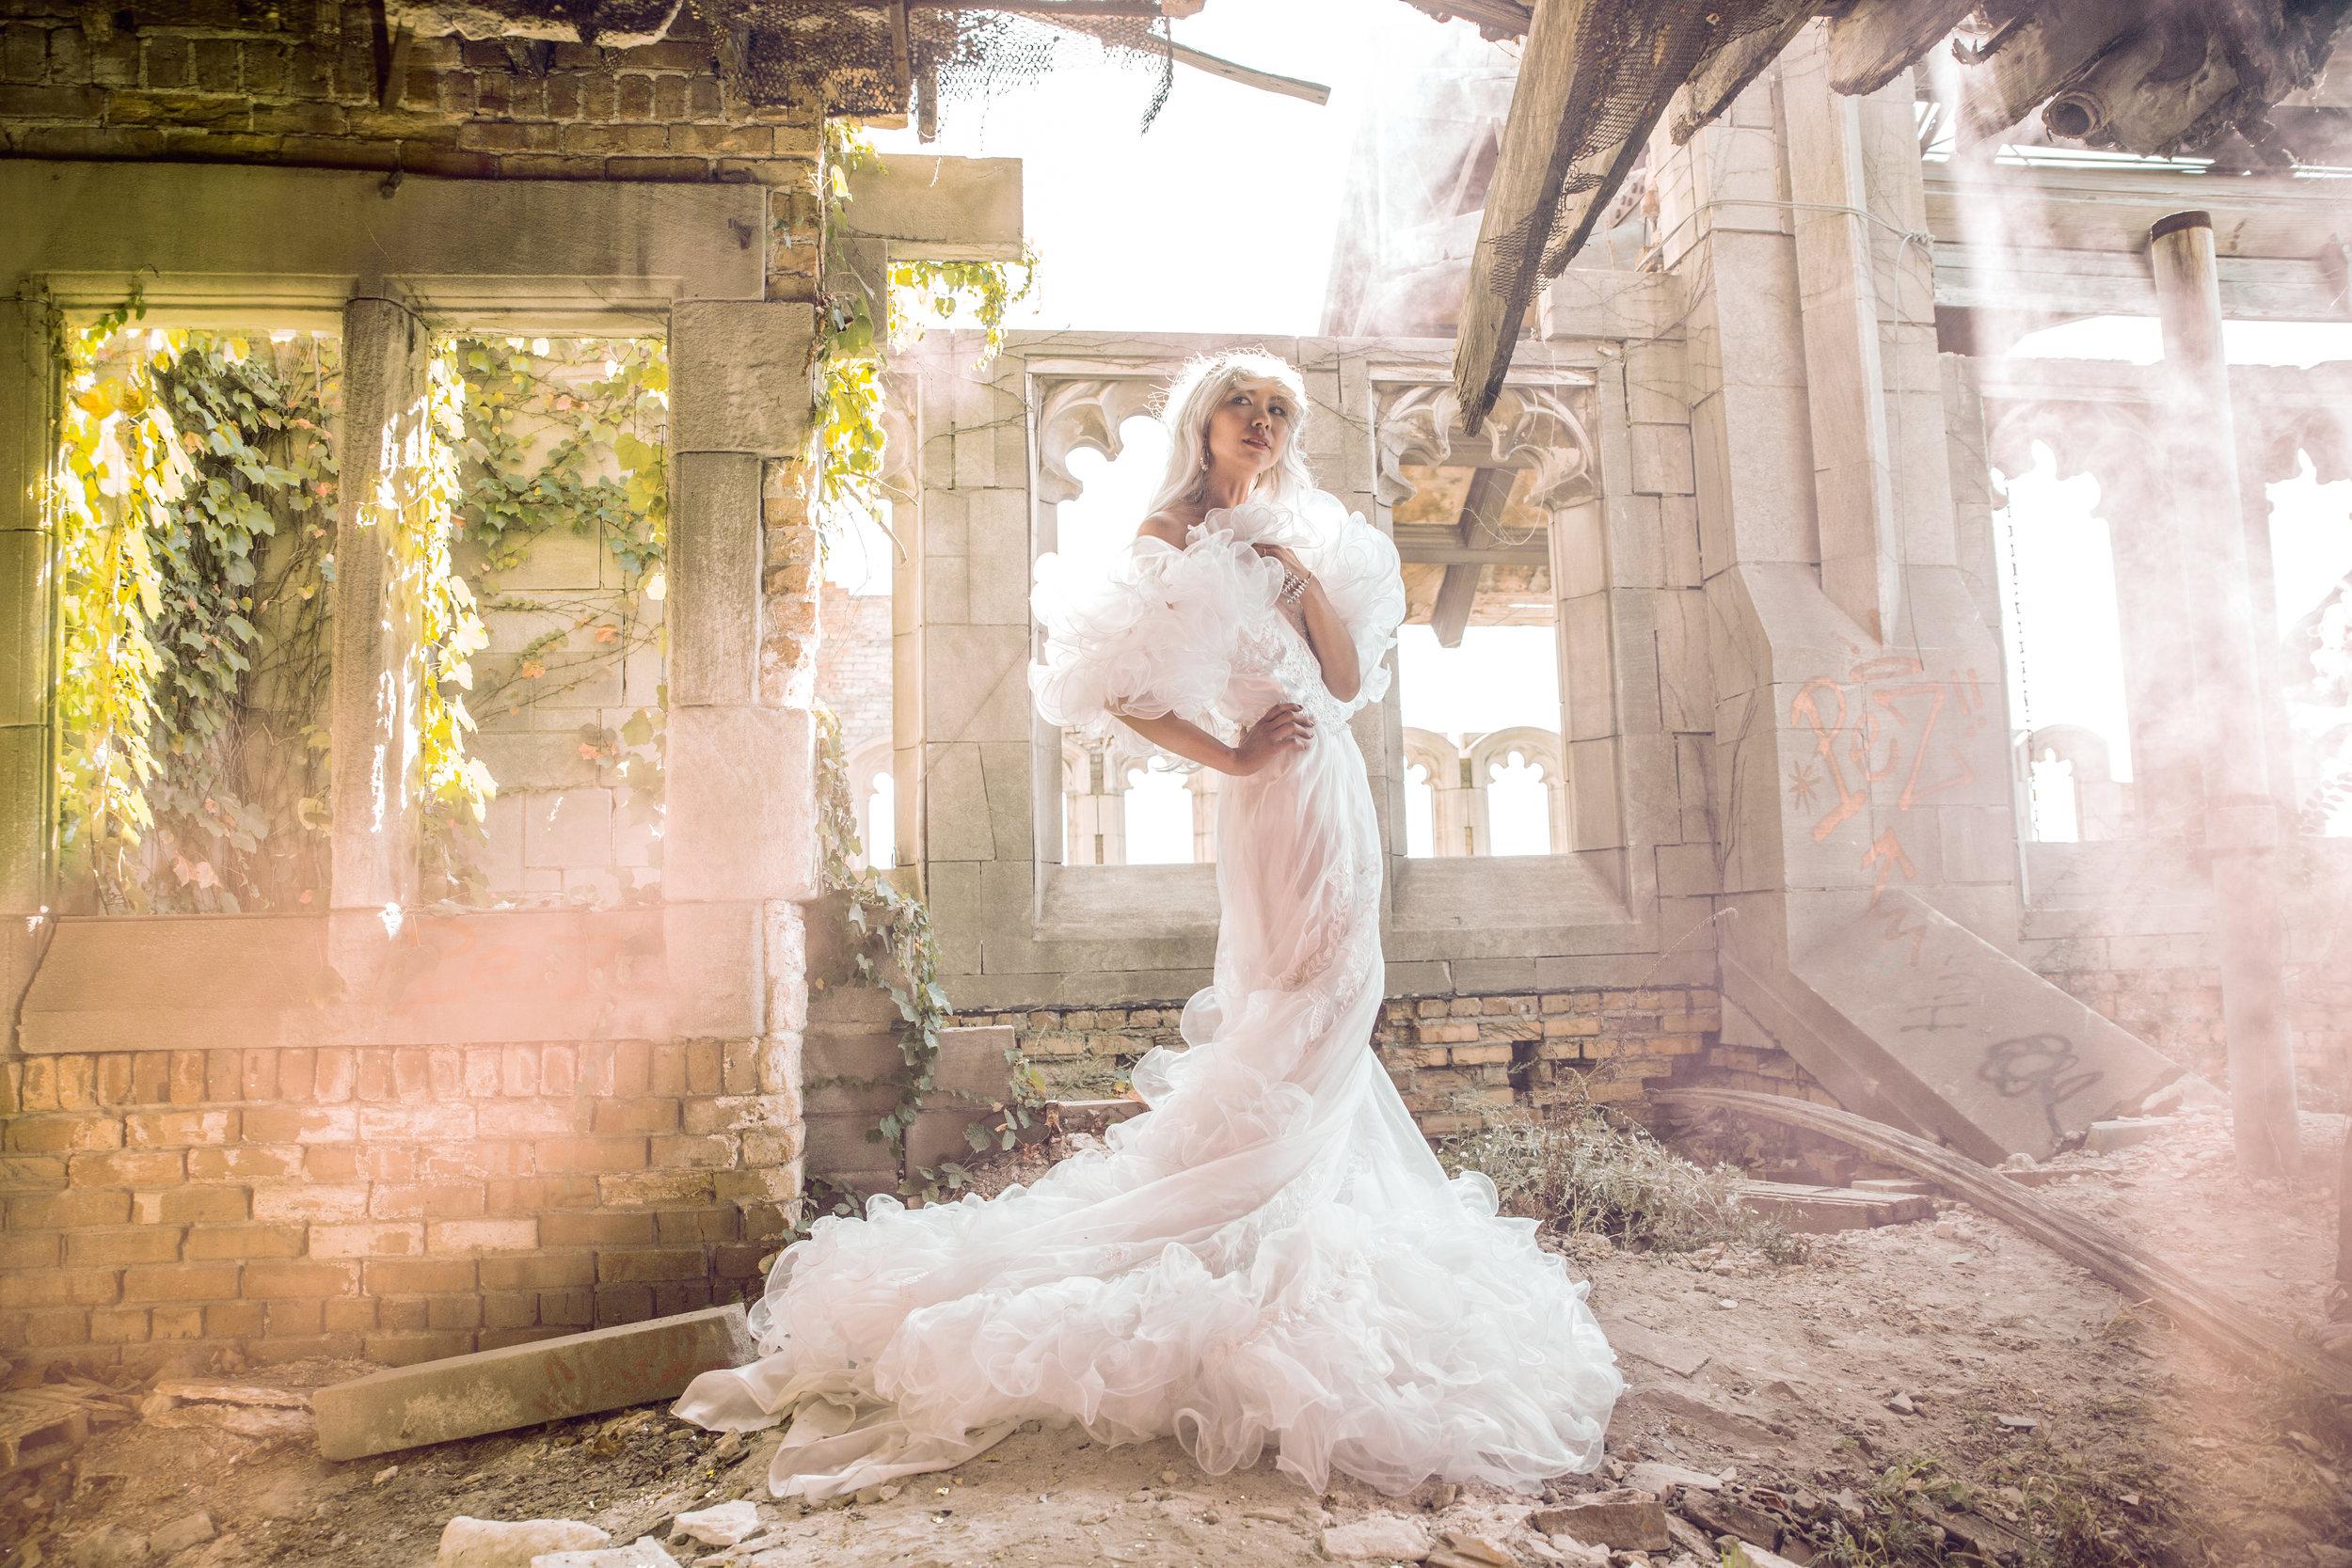 Collaboration with Linda Vang Photography Model: Keng Xiong of House of Xiong Designs MUA: Moriah Justin Assistants: Yeej Moua, Lee Vue, & Melissa Vang